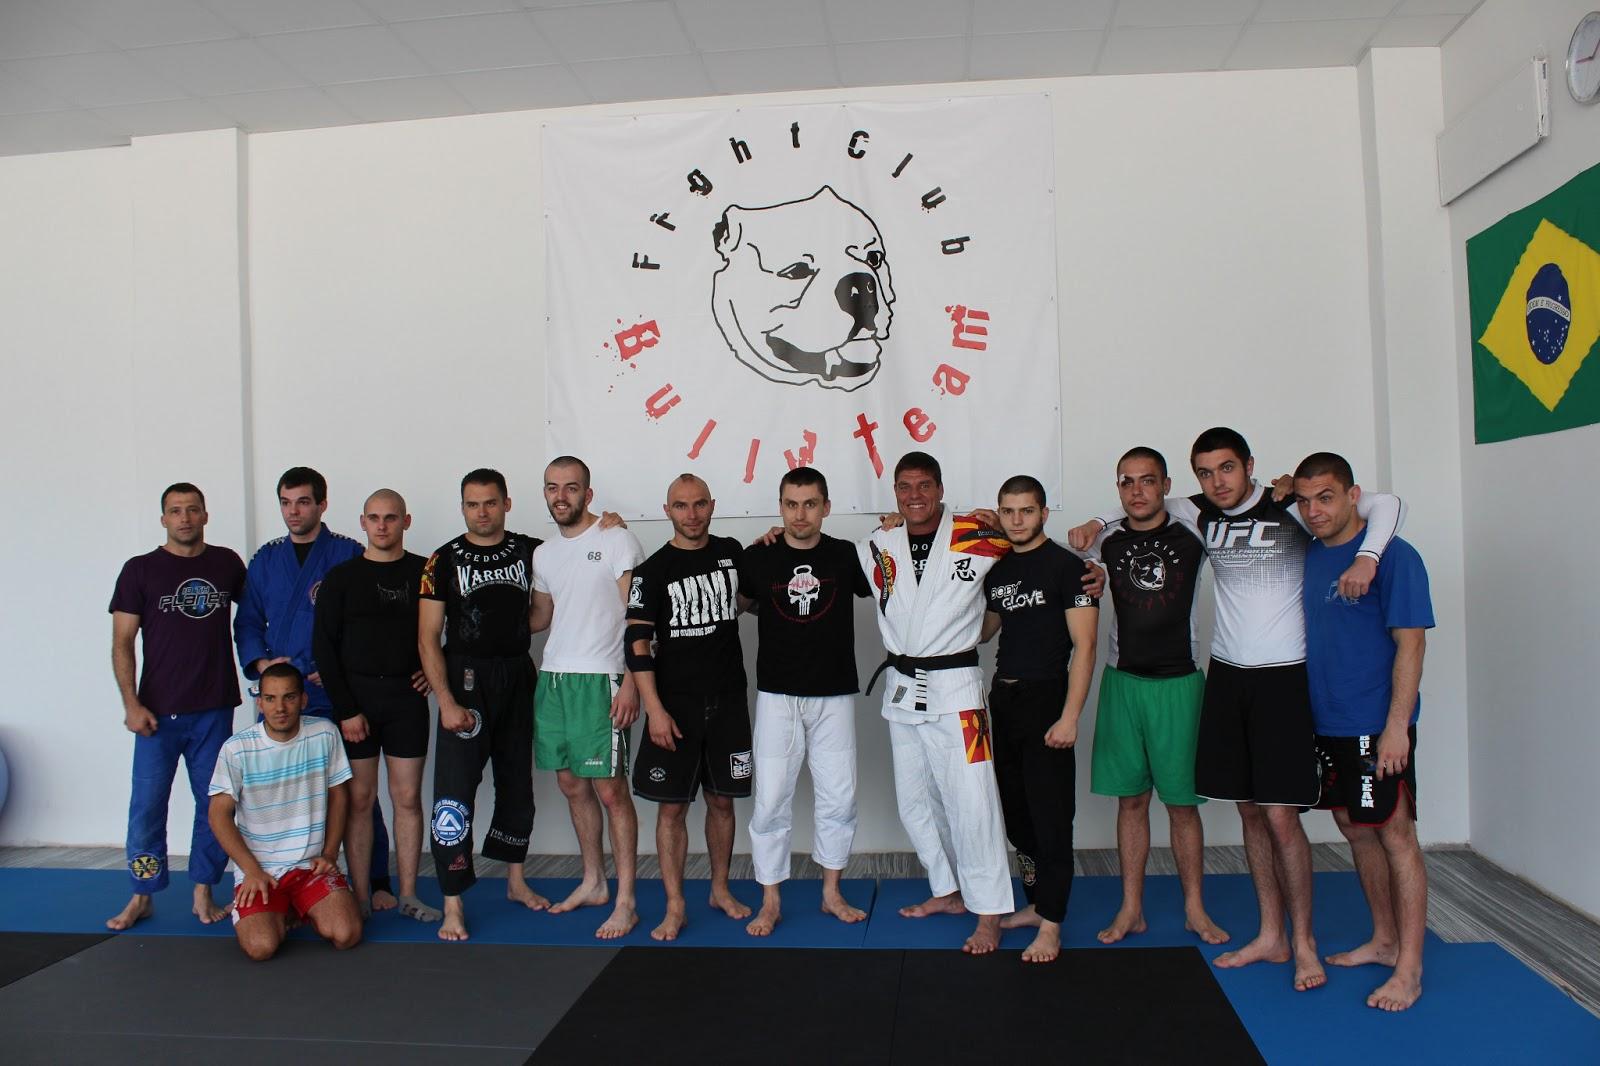 33aa0dbc9bc 11.05.2013 BJJ/MMA Seminar Jorge Pereira. Sofia, Bulgaria.